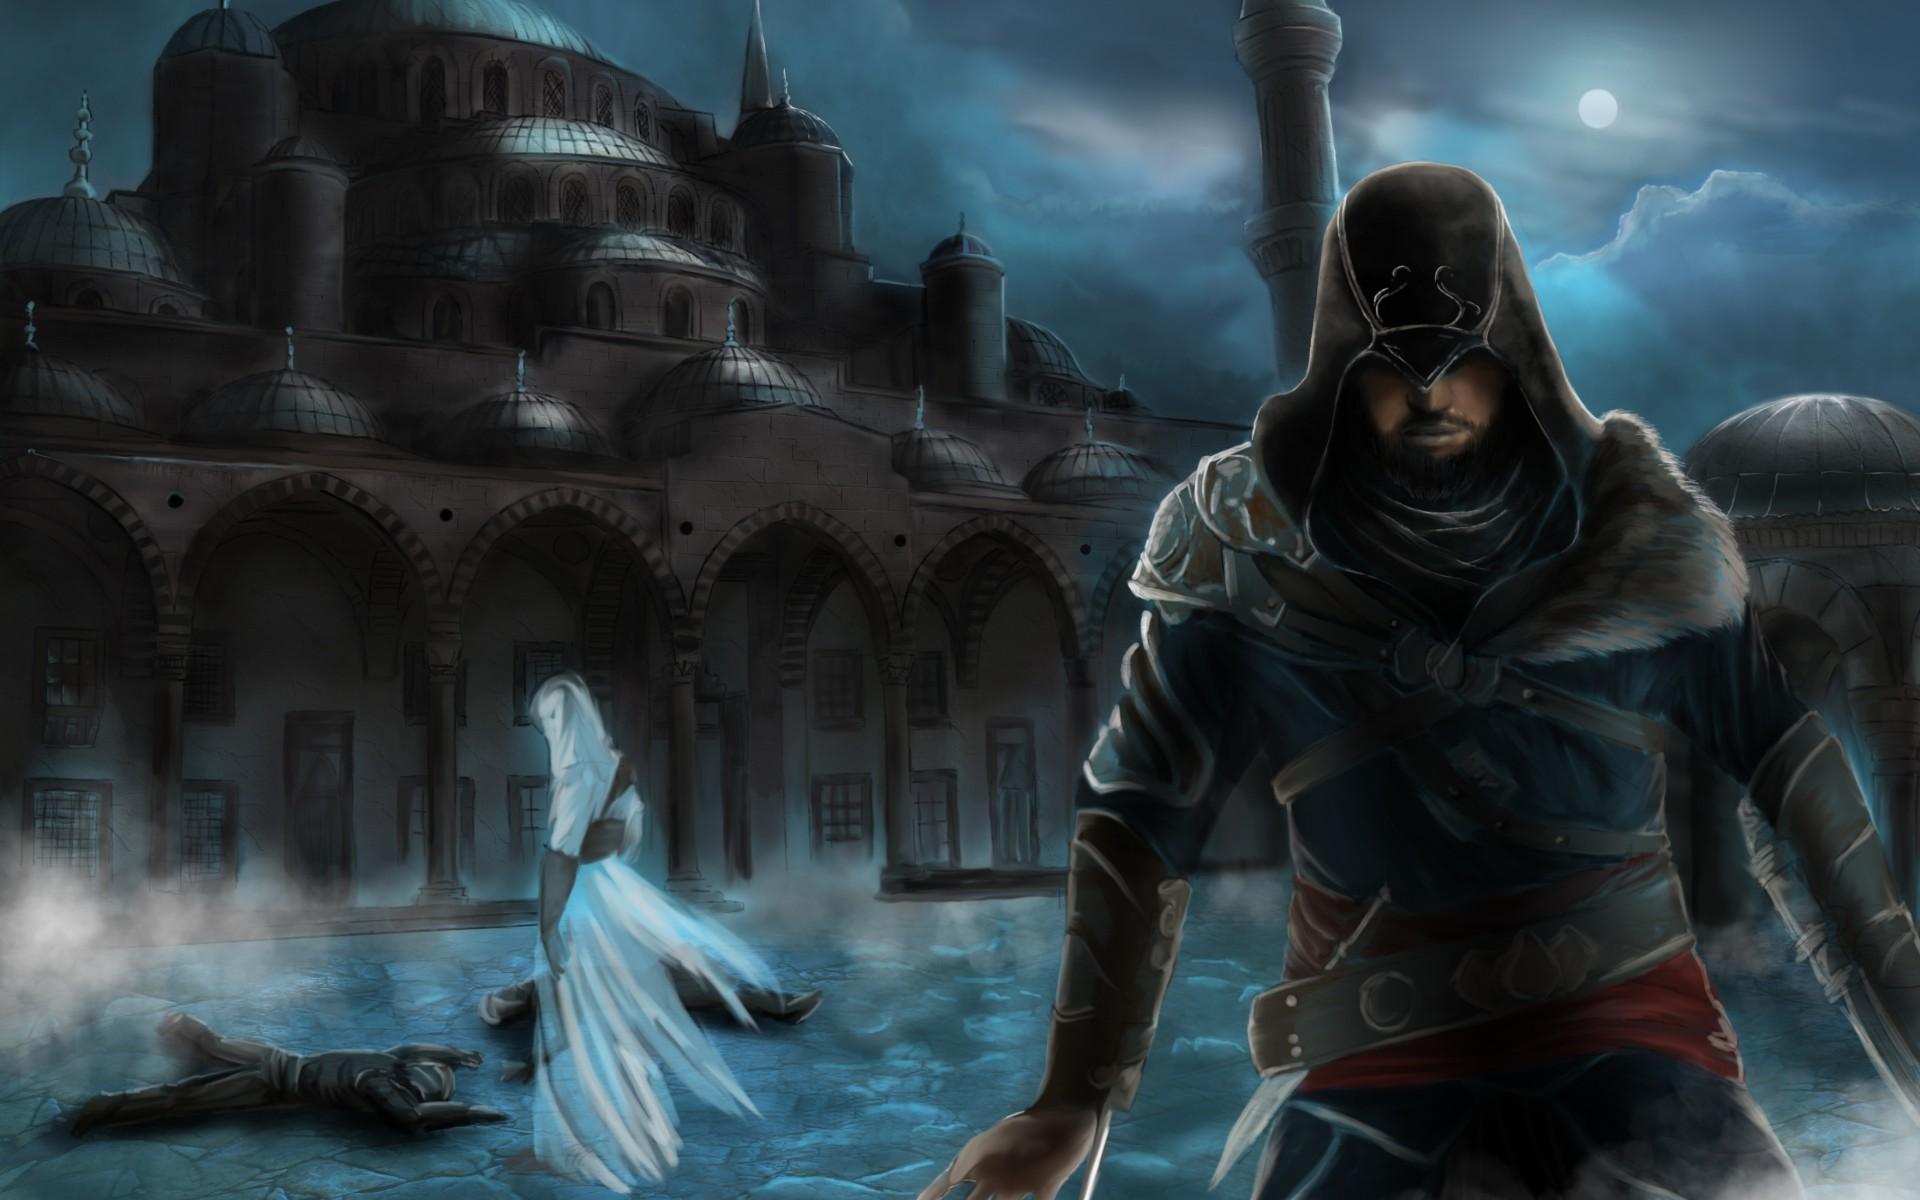 Assassin's Creed Revelations Constantinople mosque Ezio Altair city  night wallpaper | | 48293 | WallpaperUP